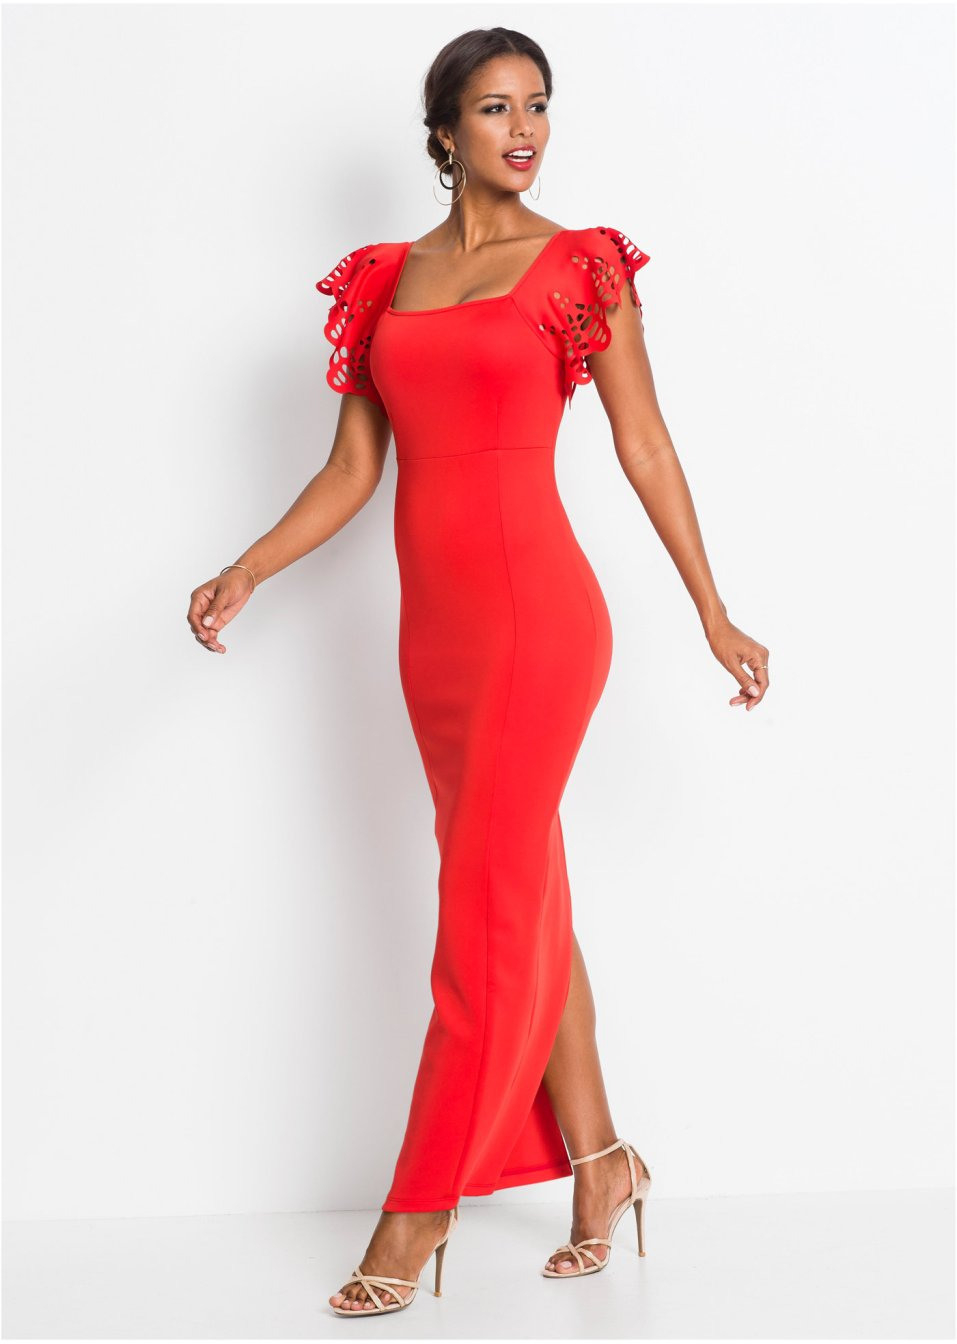 Kleid Rot  Damen  Bodyflirt Boutique  Bonprixat